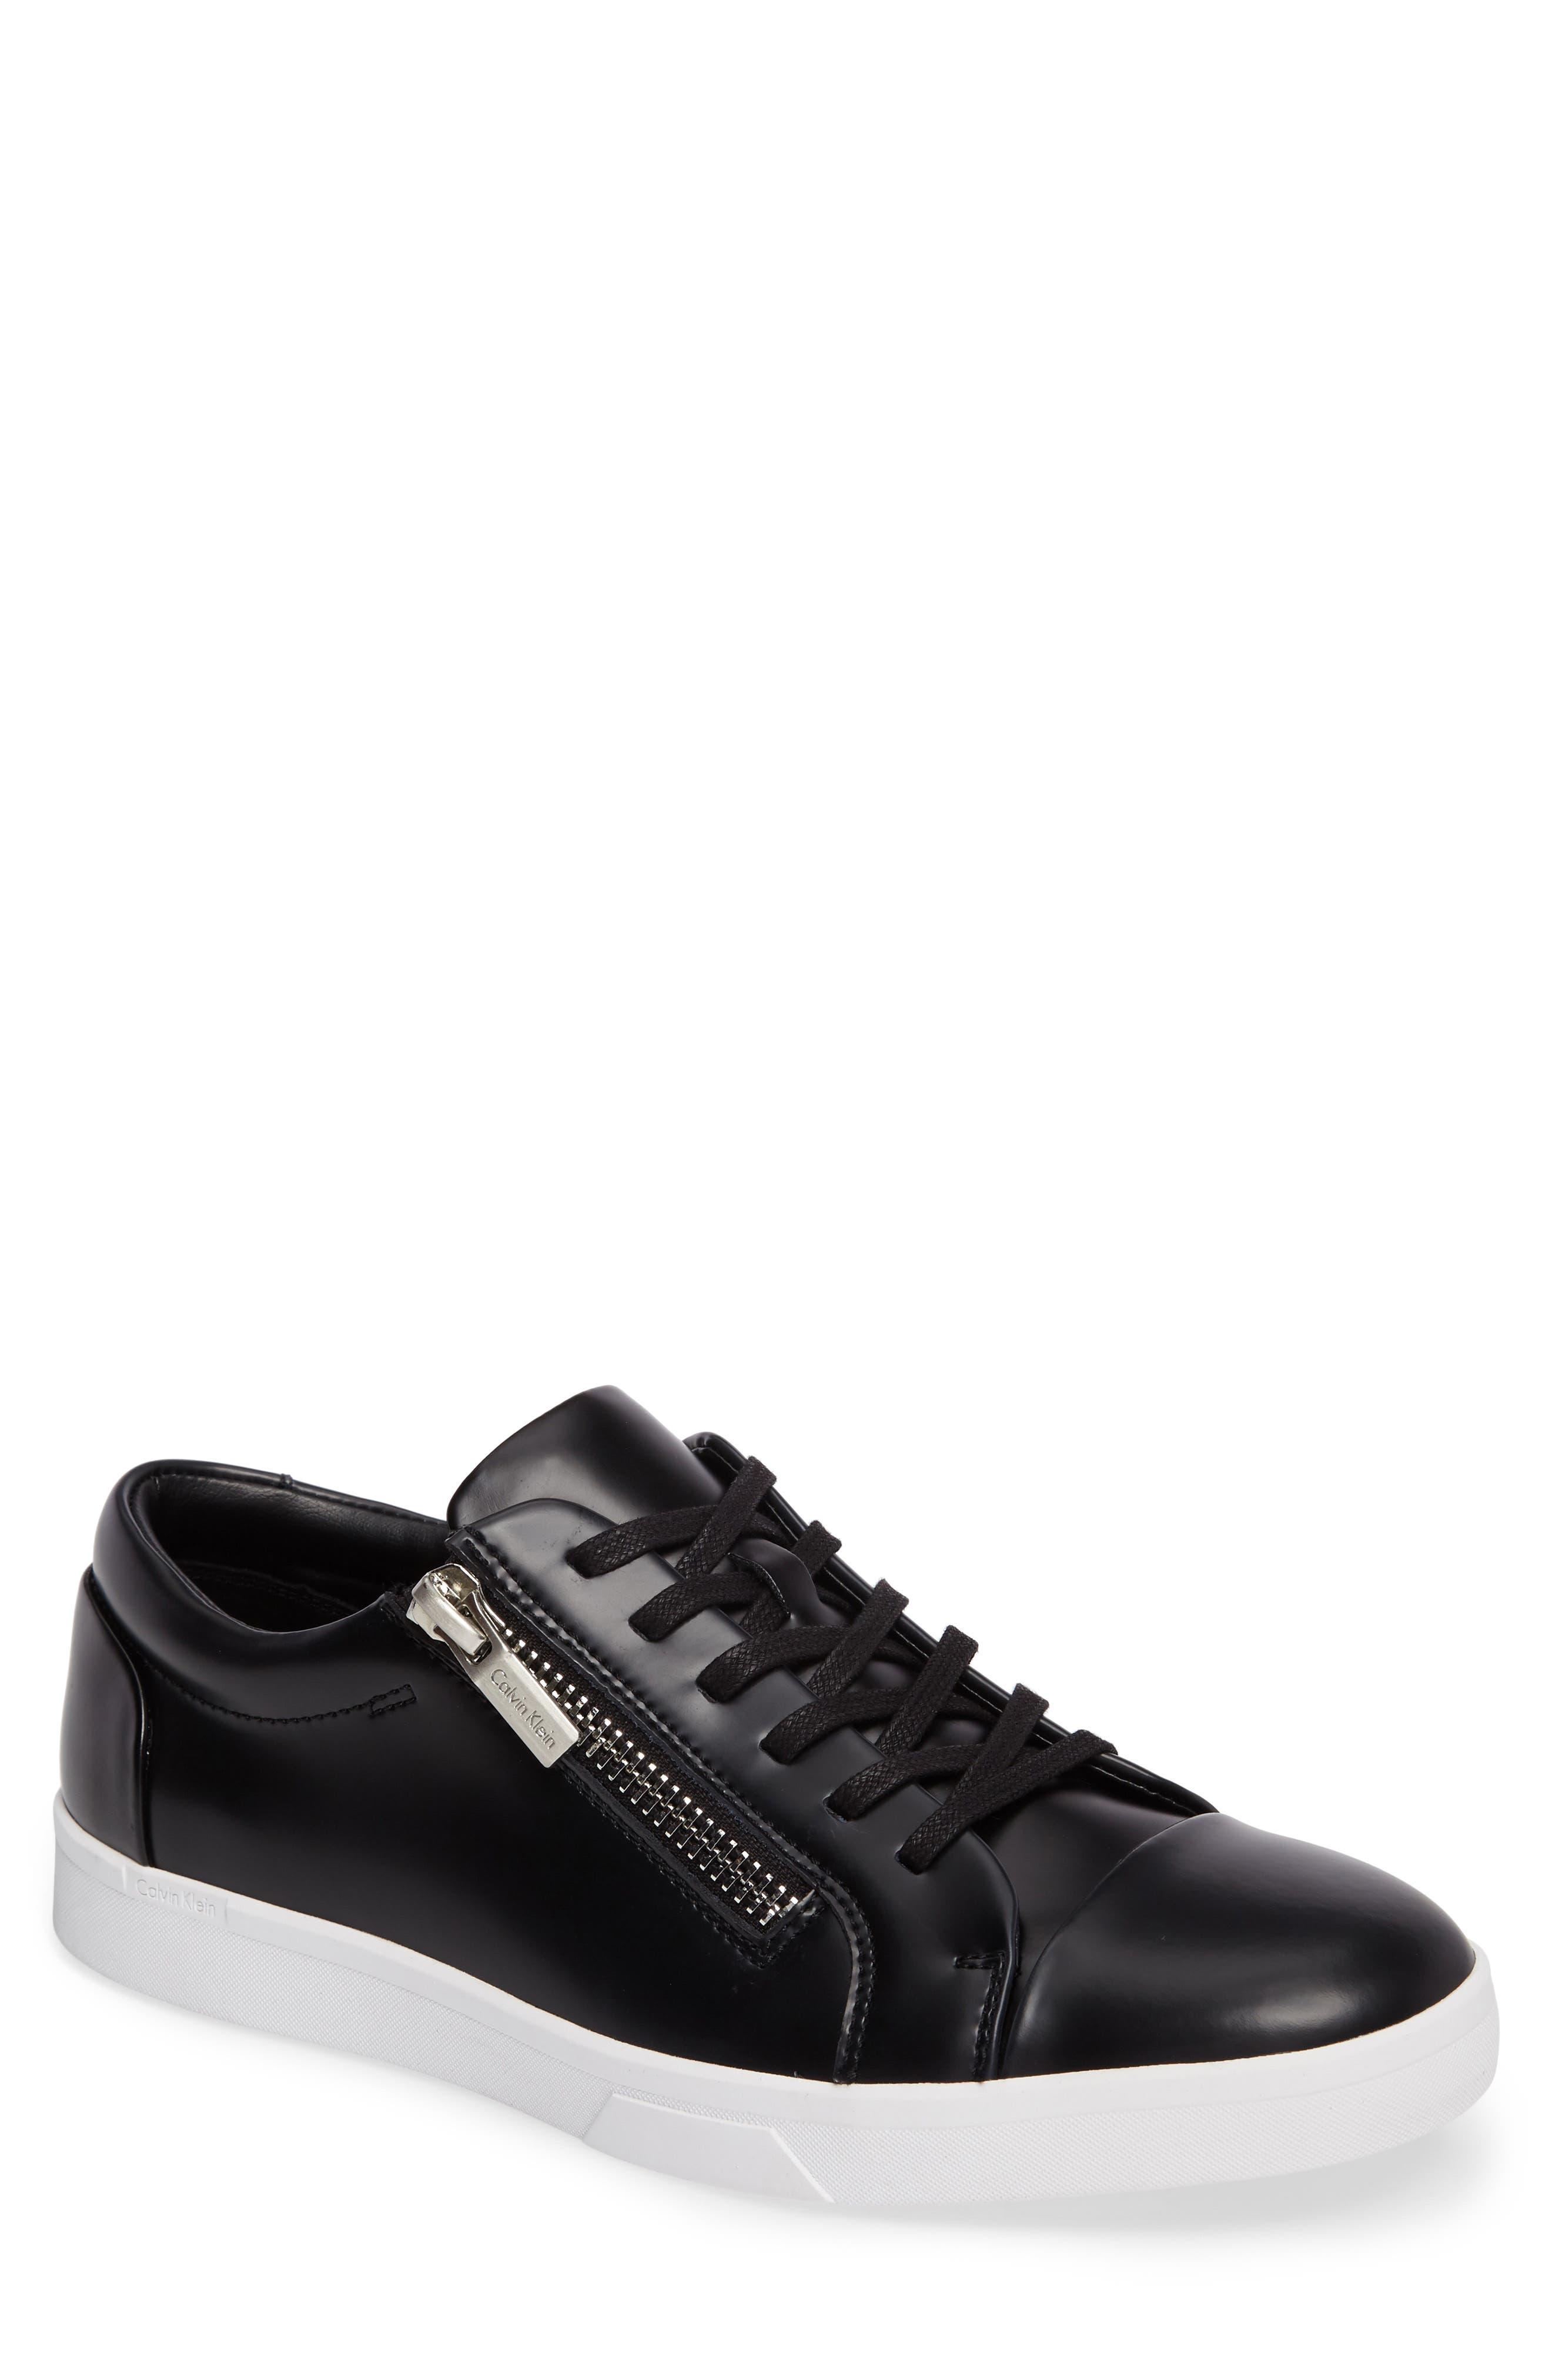 Ibrahim Cap-Toe Zip Sneaker,                             Main thumbnail 1, color,                             001